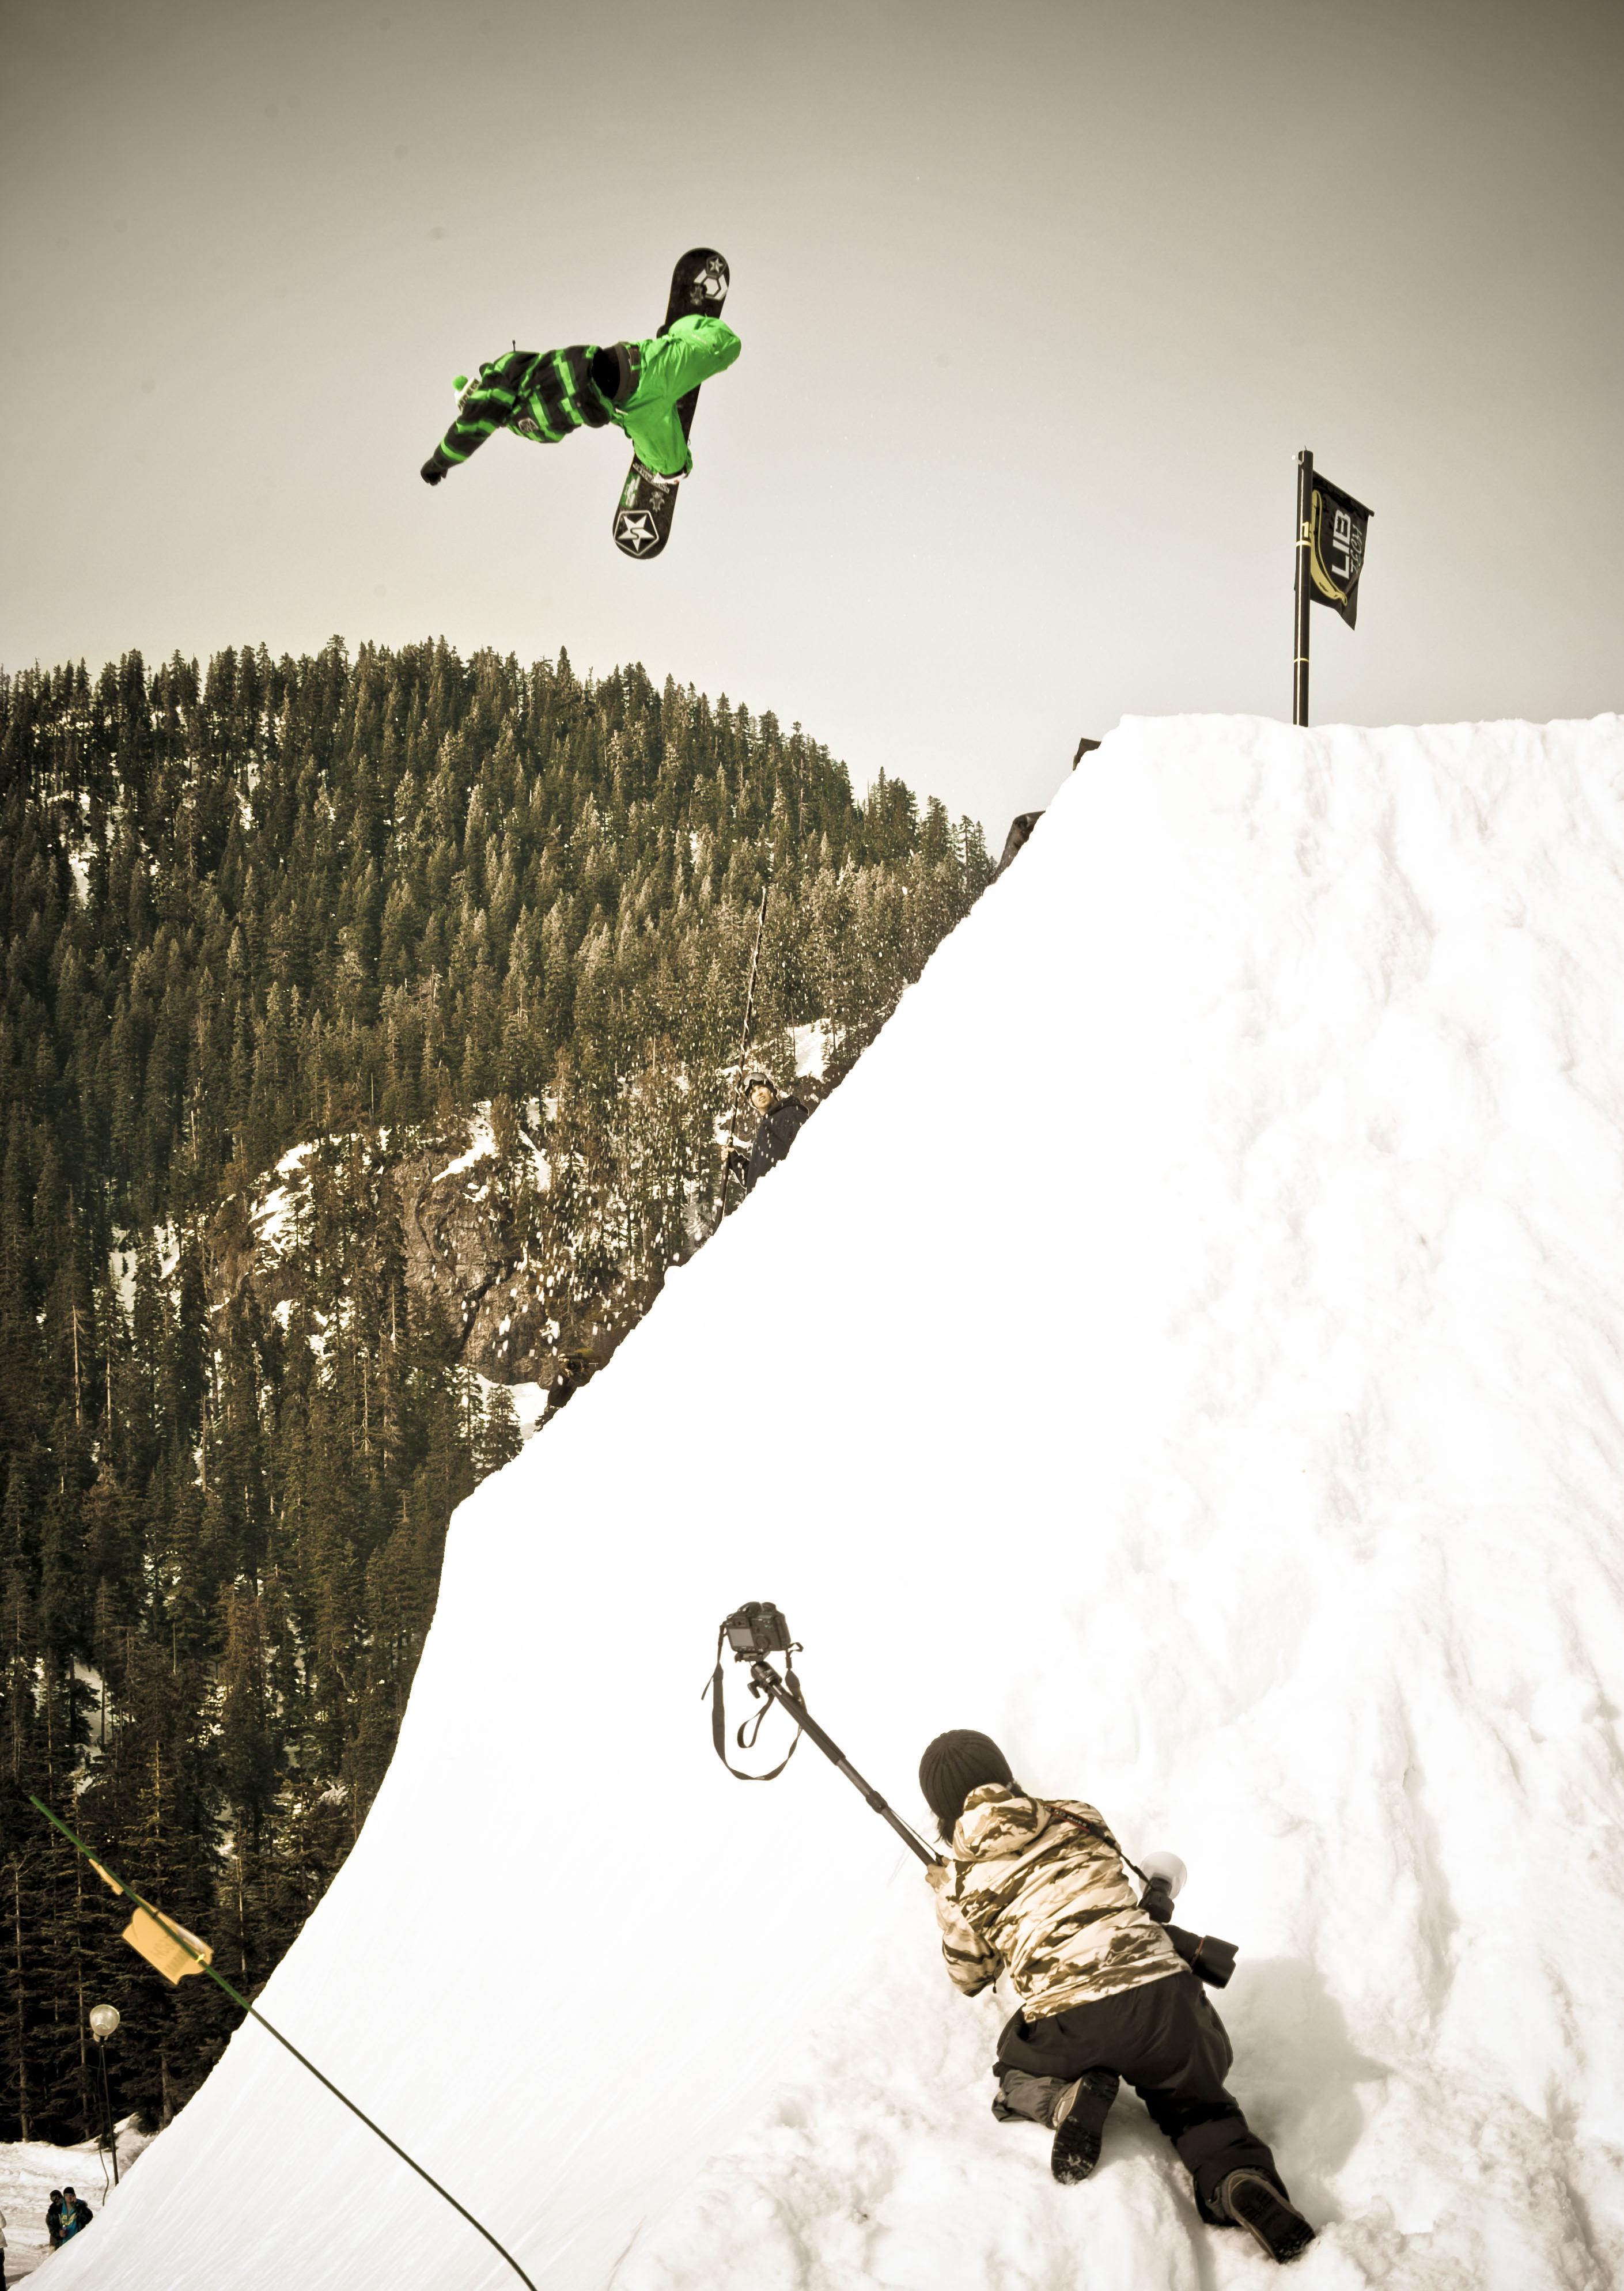 Kurt Jenson - Holy Oly Revival / Snoqualmie - Alex Mertz Photo